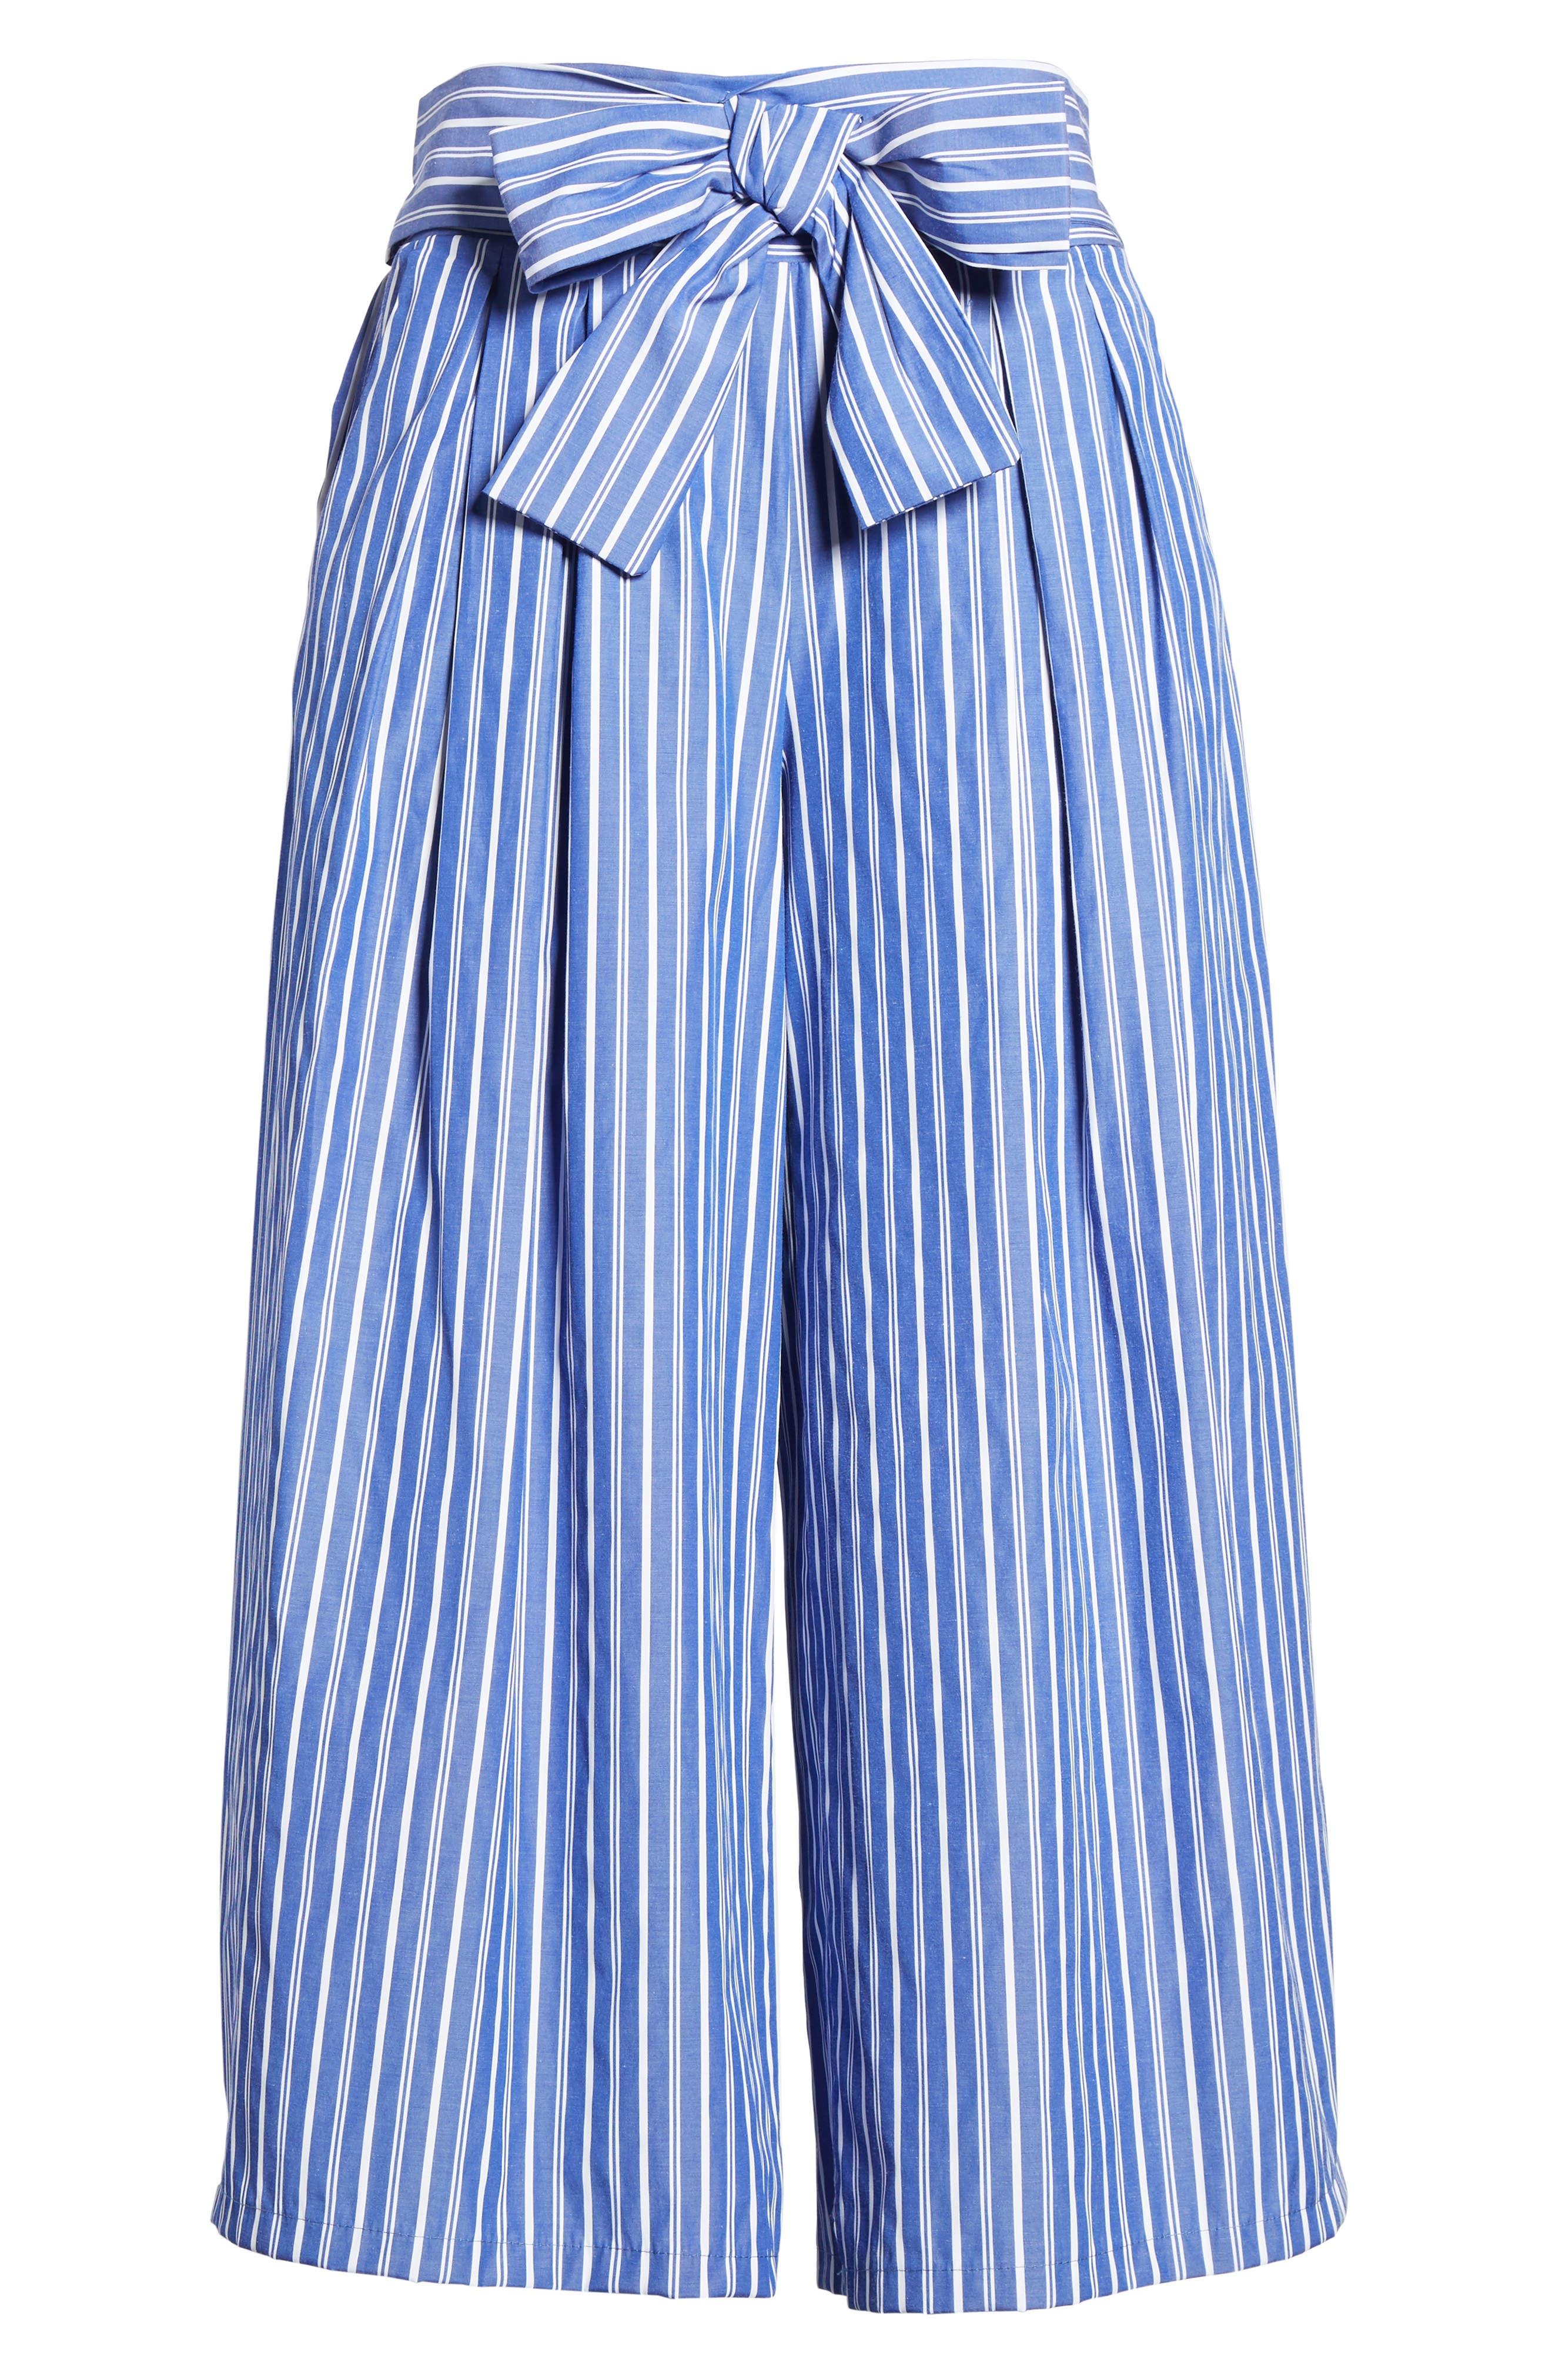 Zadeh Pants,                             Alternate thumbnail 6, color,                             Blue/ White